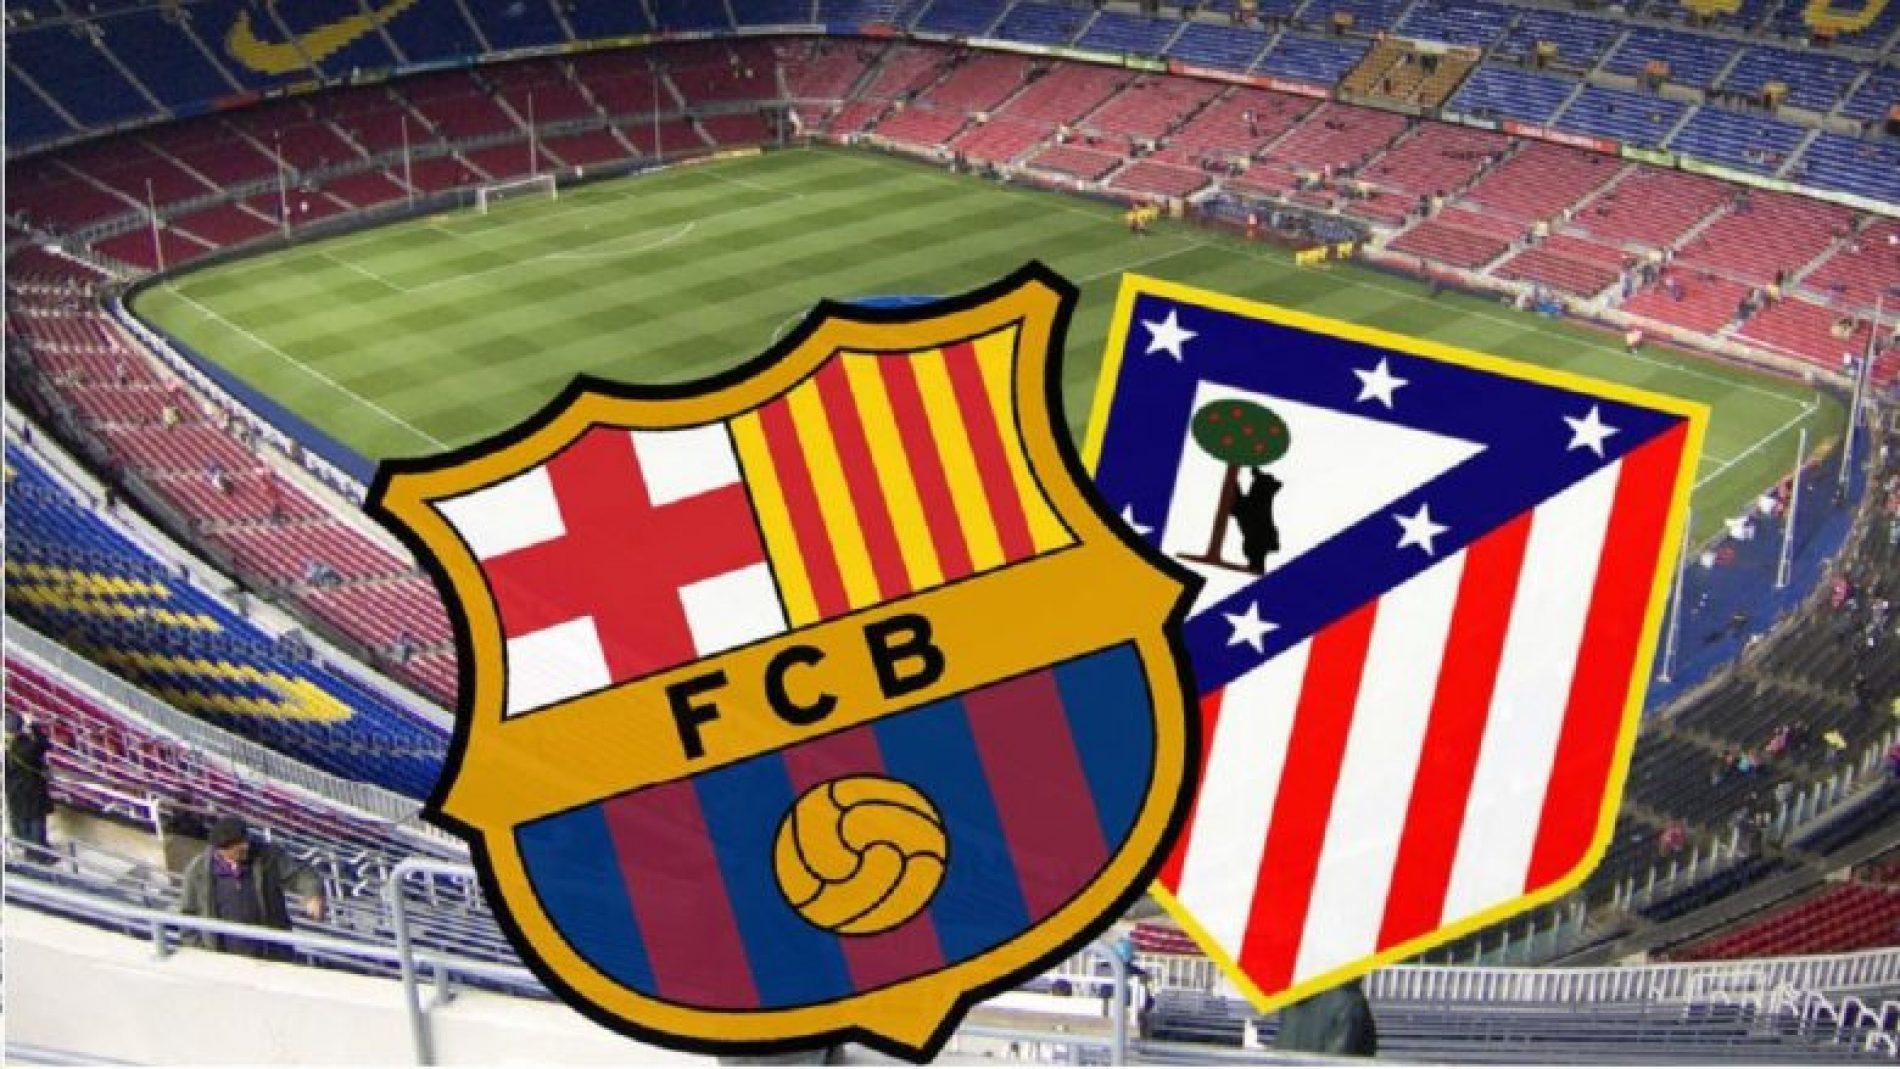 Formacionet e mundshme, Barcelona – Atletico (Foto)